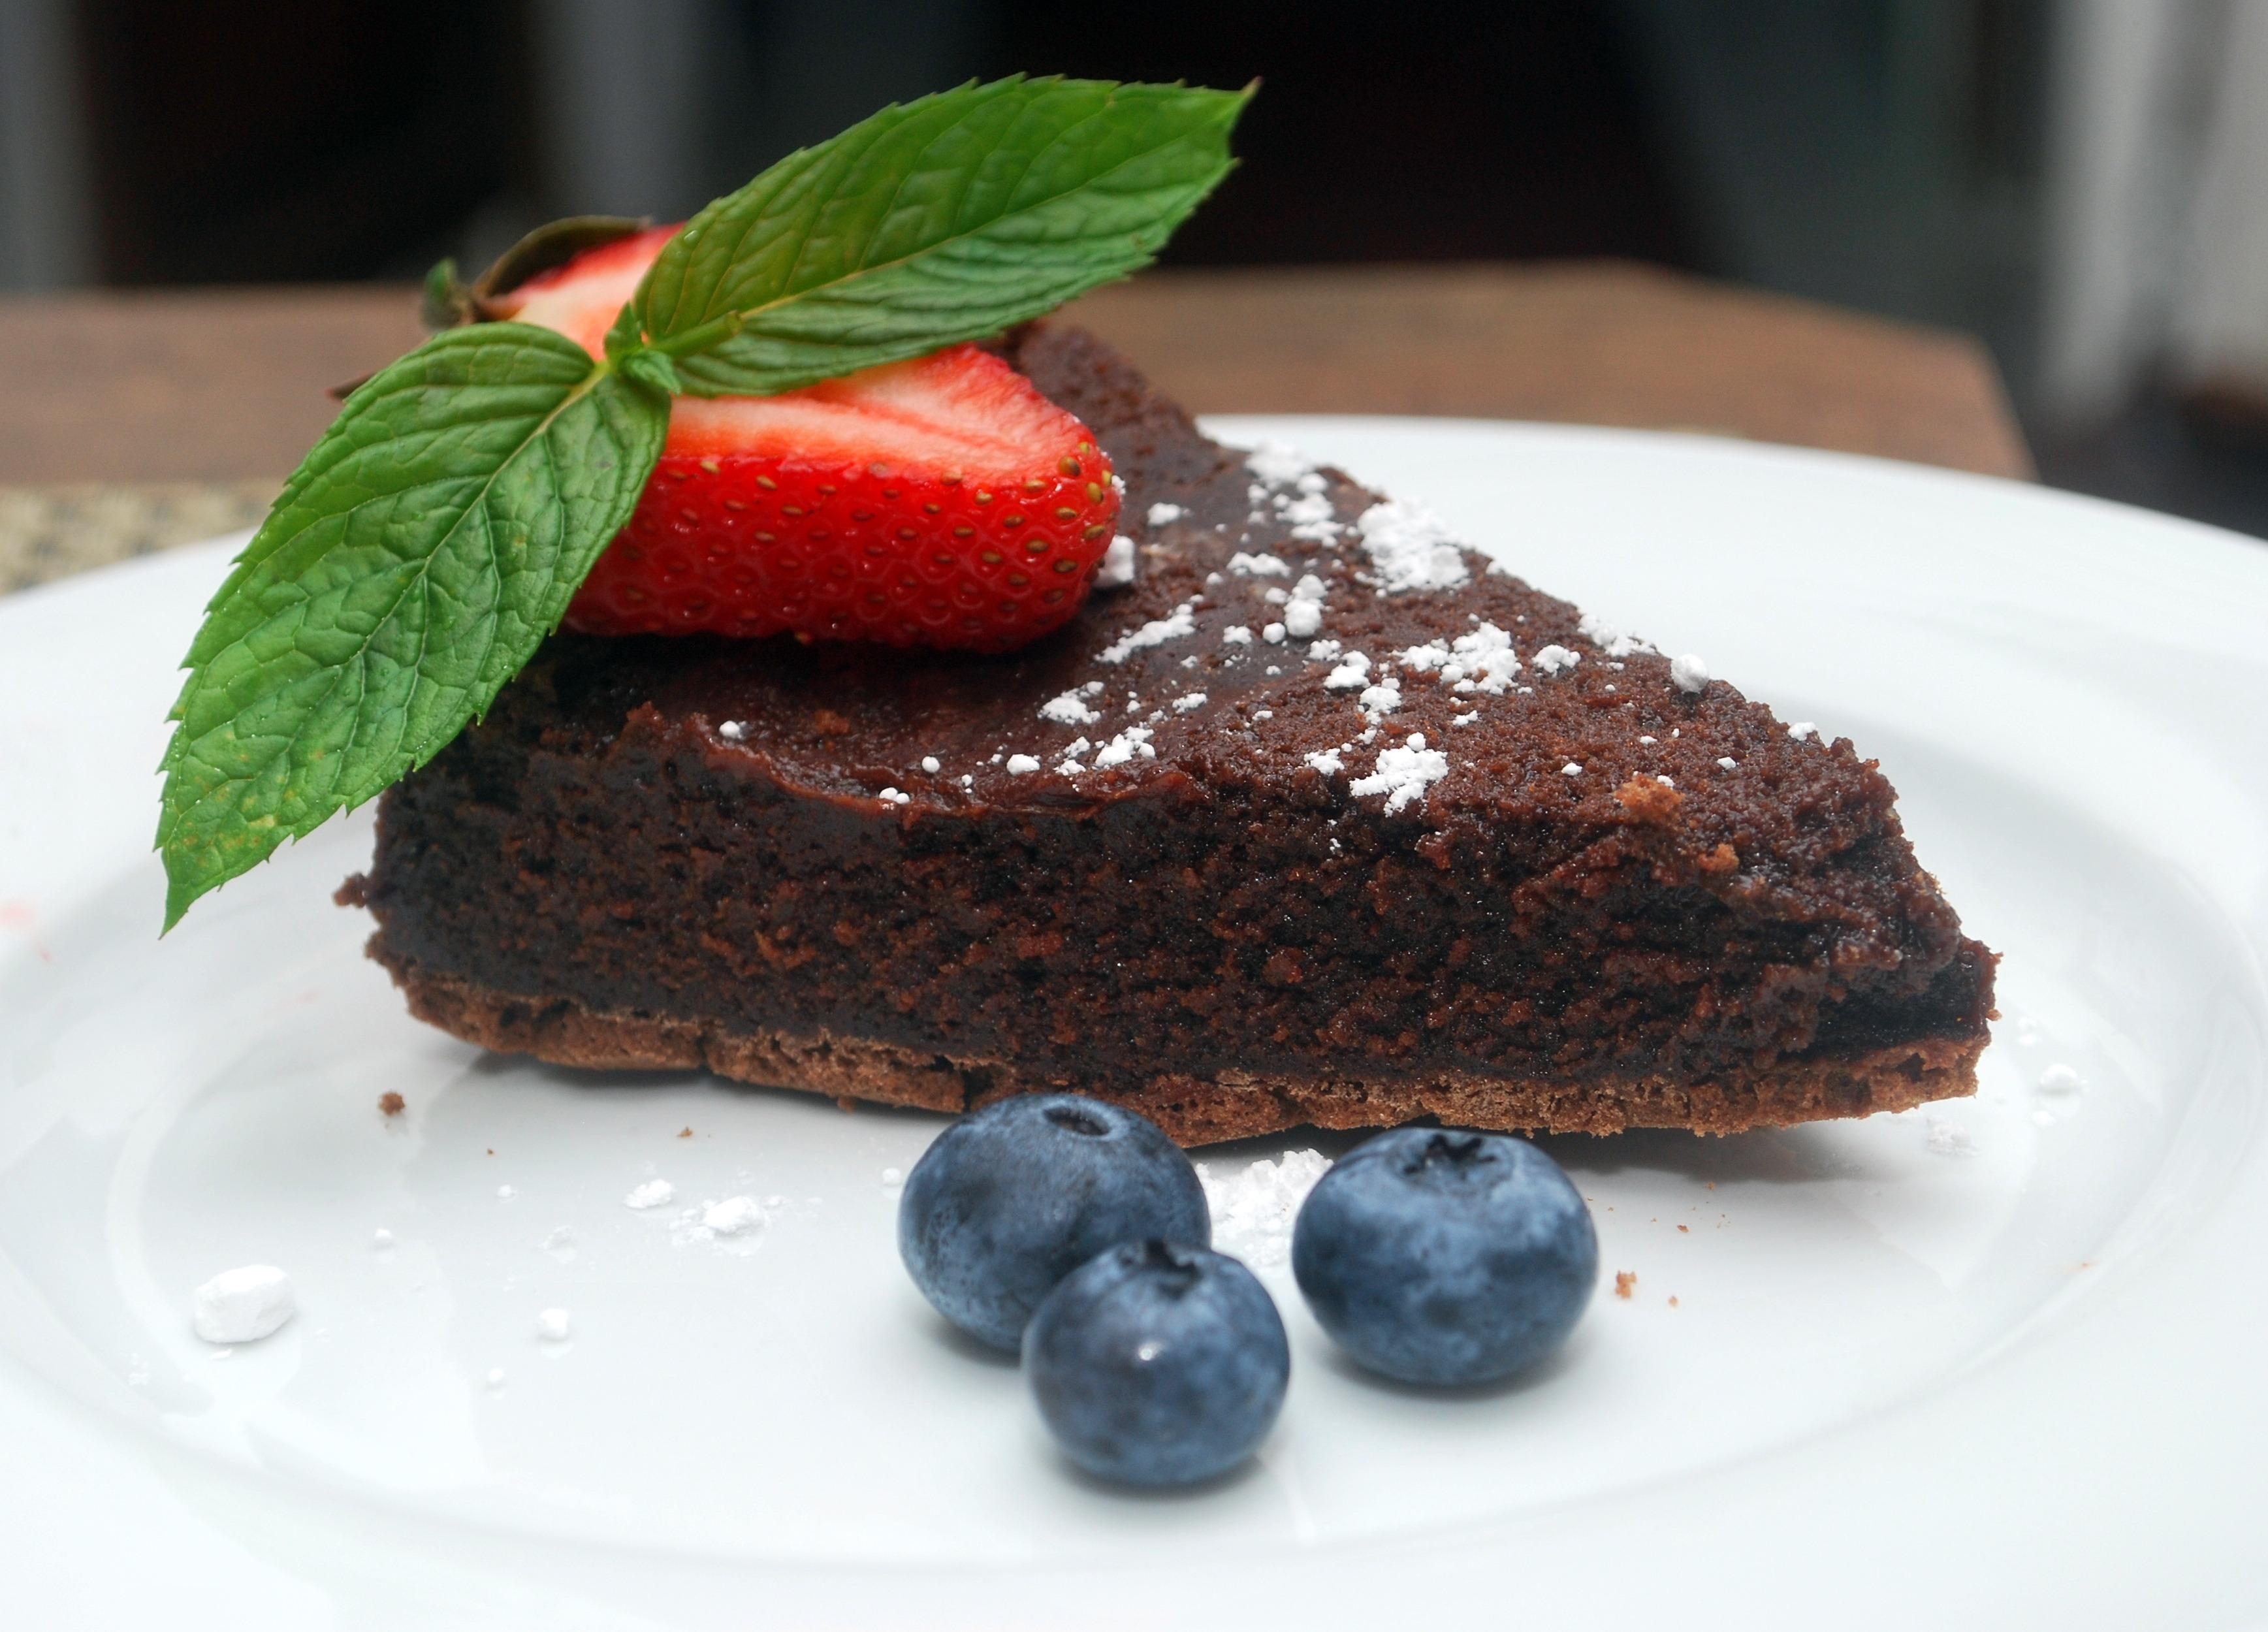 Francois paynard s flourless chocolate cake recipe